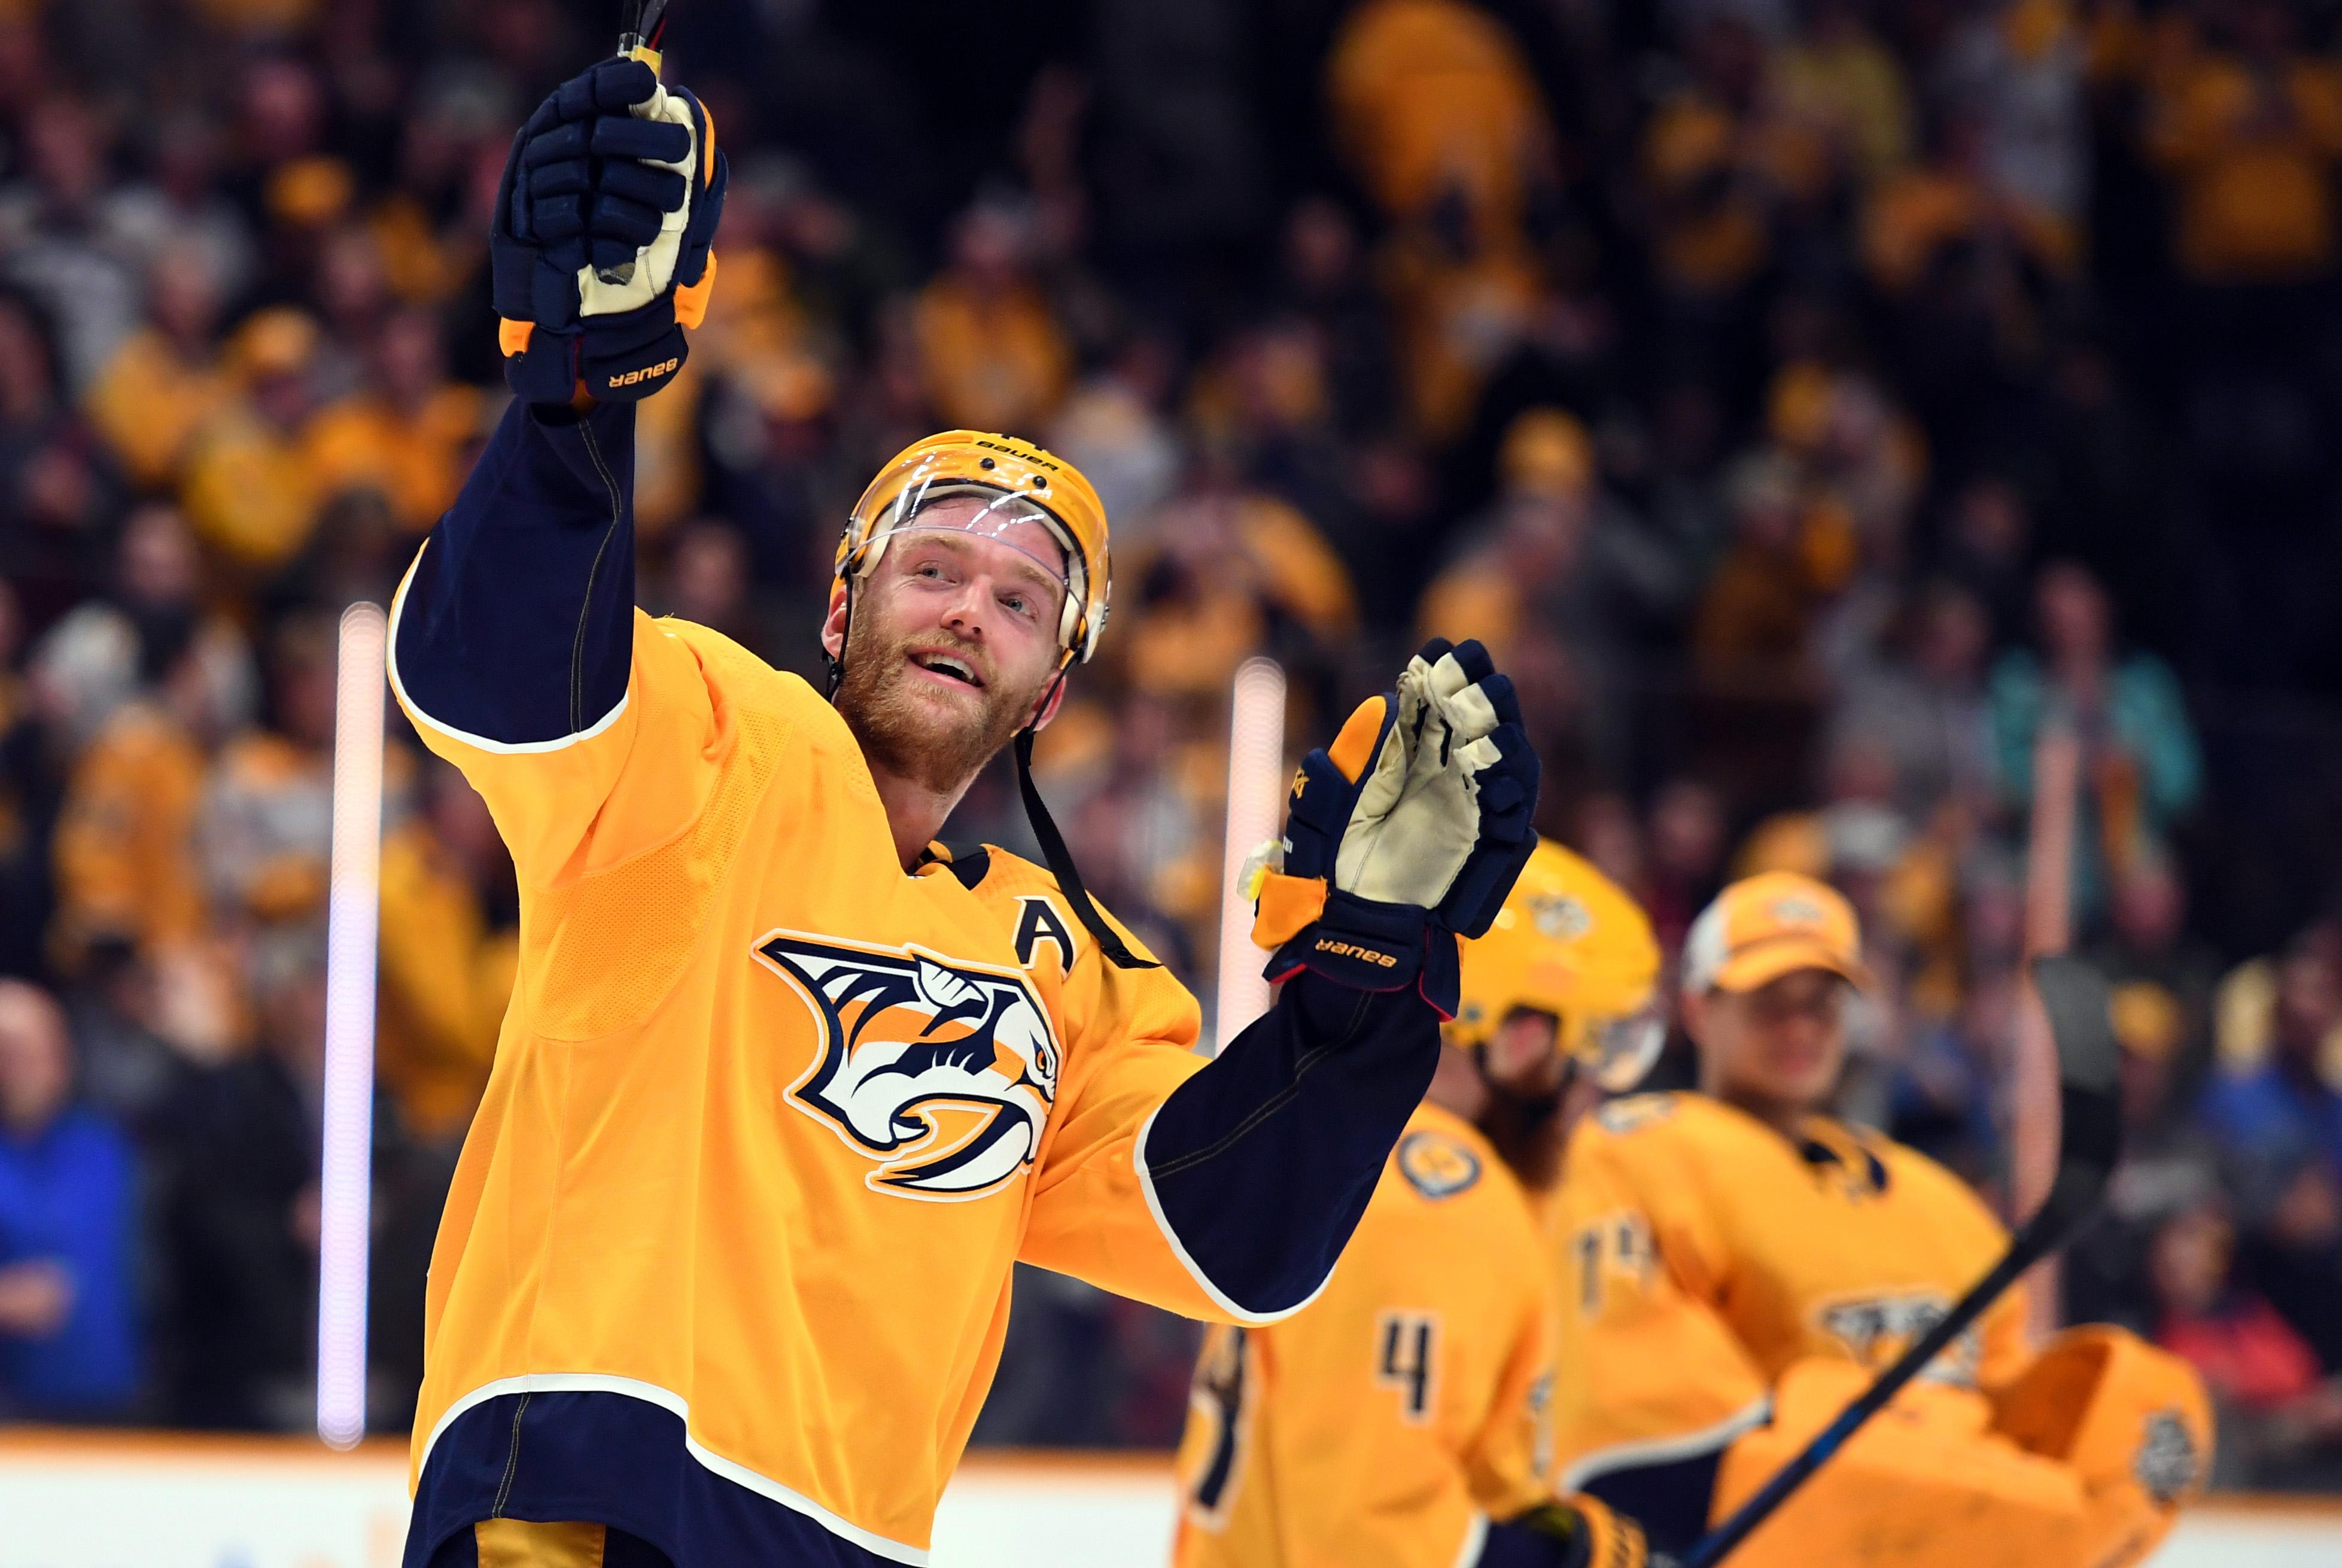 NHL: Los Angeles Kings at Nashville Predators